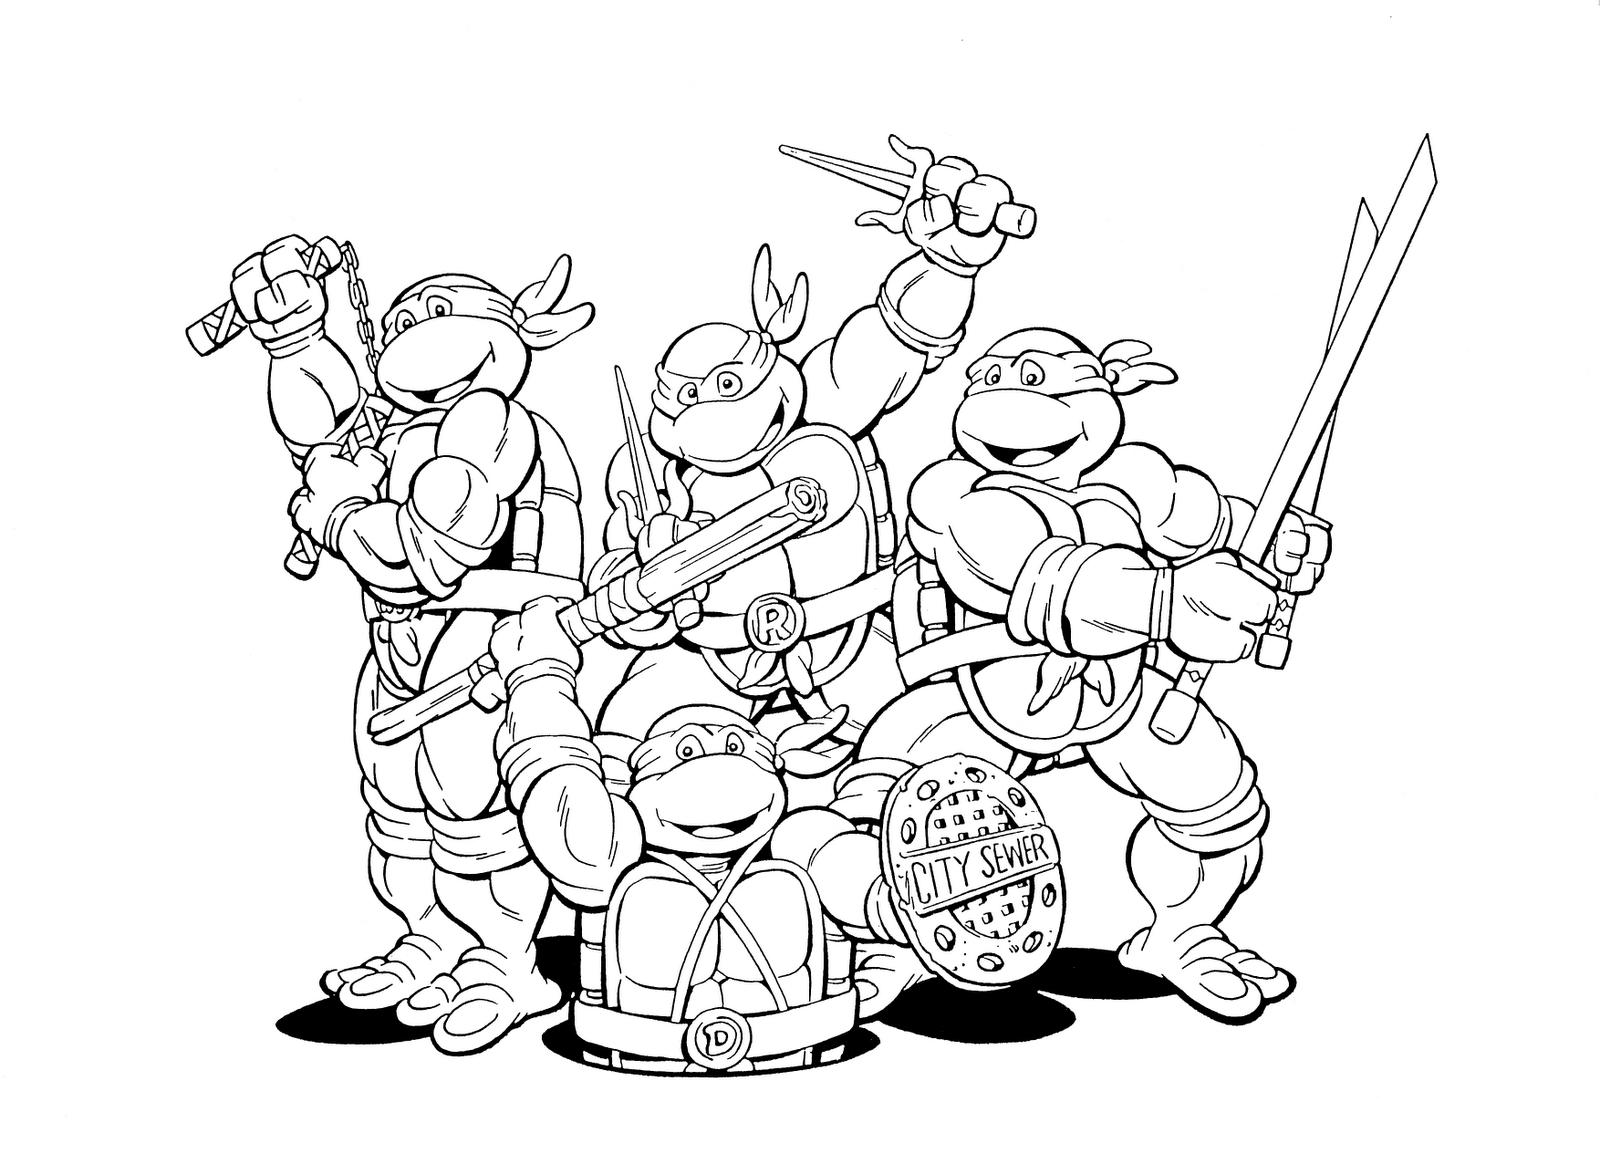 Teenage Mutant Ninja Turtles Coloring Pages - Teenage Mutant Ninja Turtles Free Printable Mask